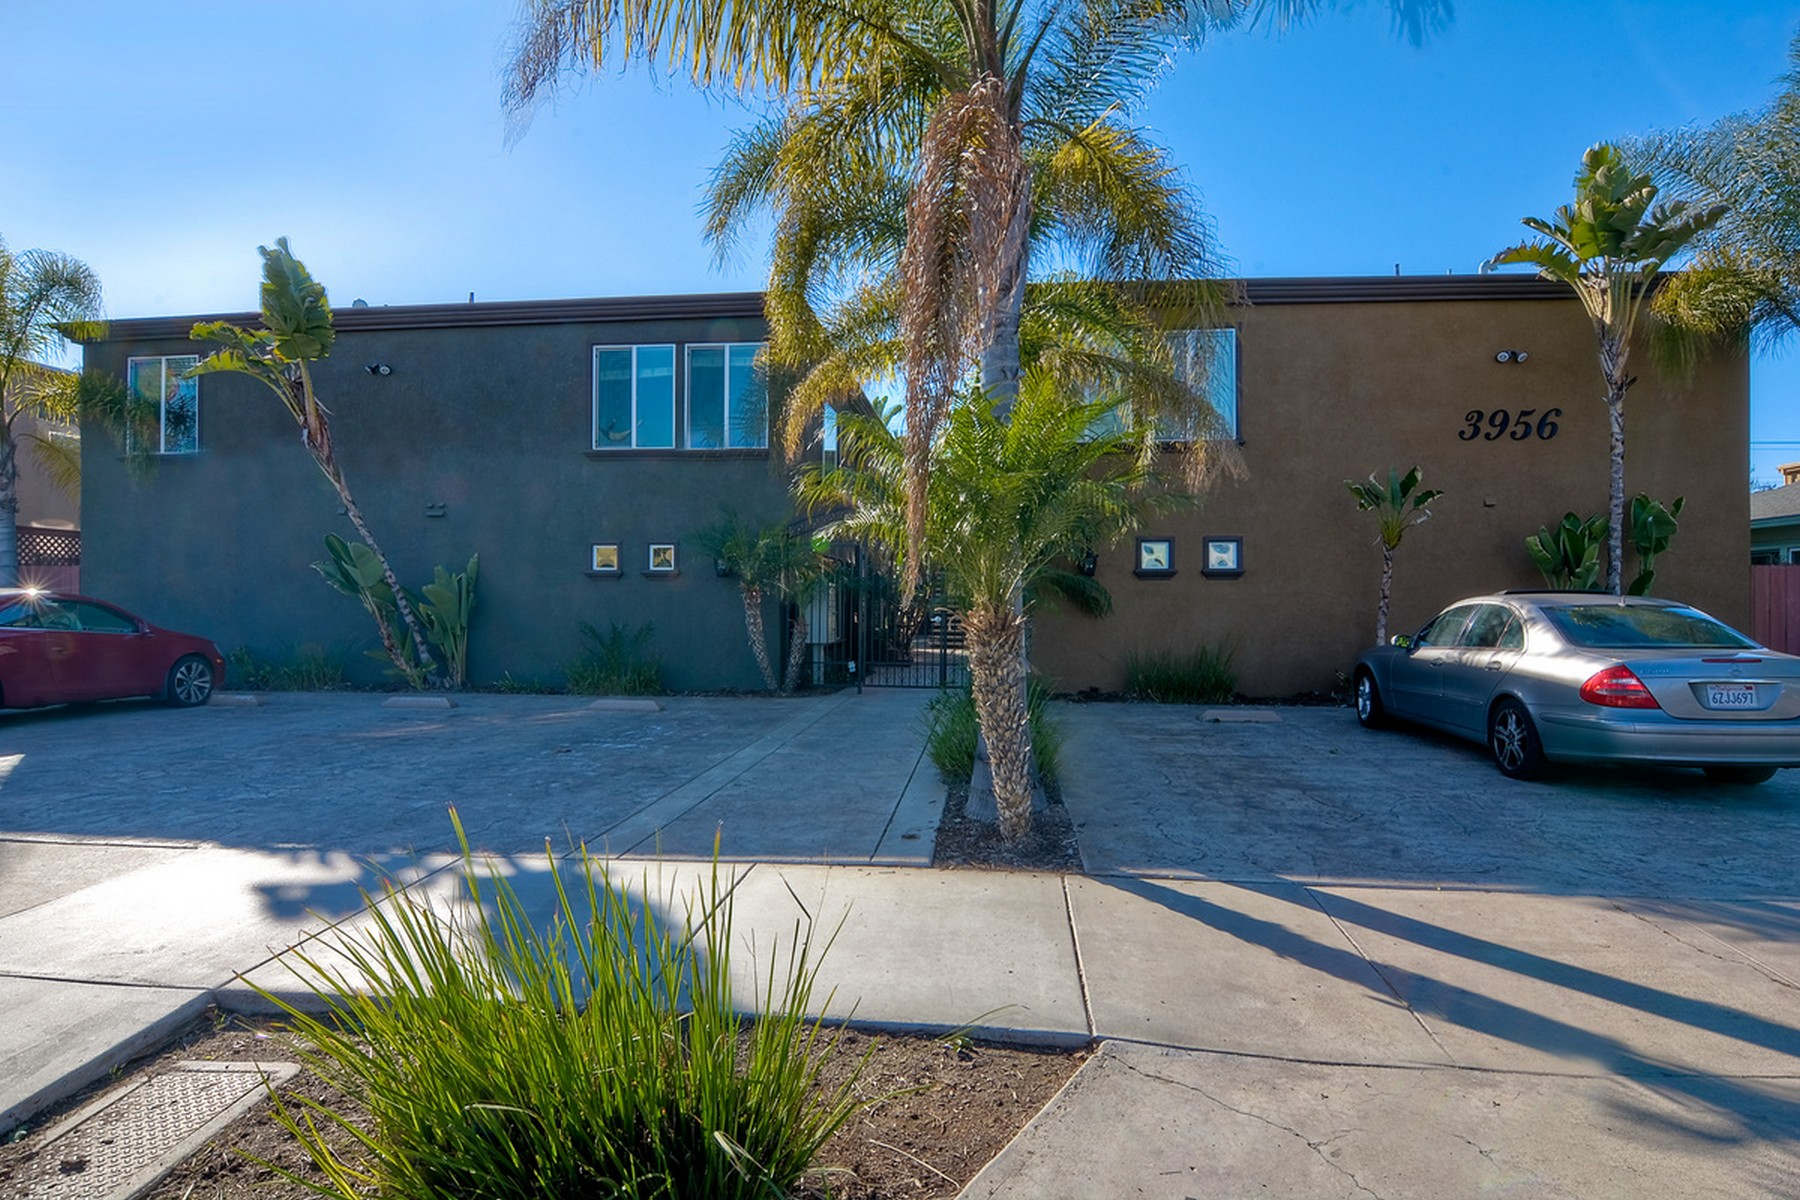 Piso por un Venta en 3956 Texas Street,4 3956 Texas Street 4 North Park, San Diego, California 92104 Estados Unidos